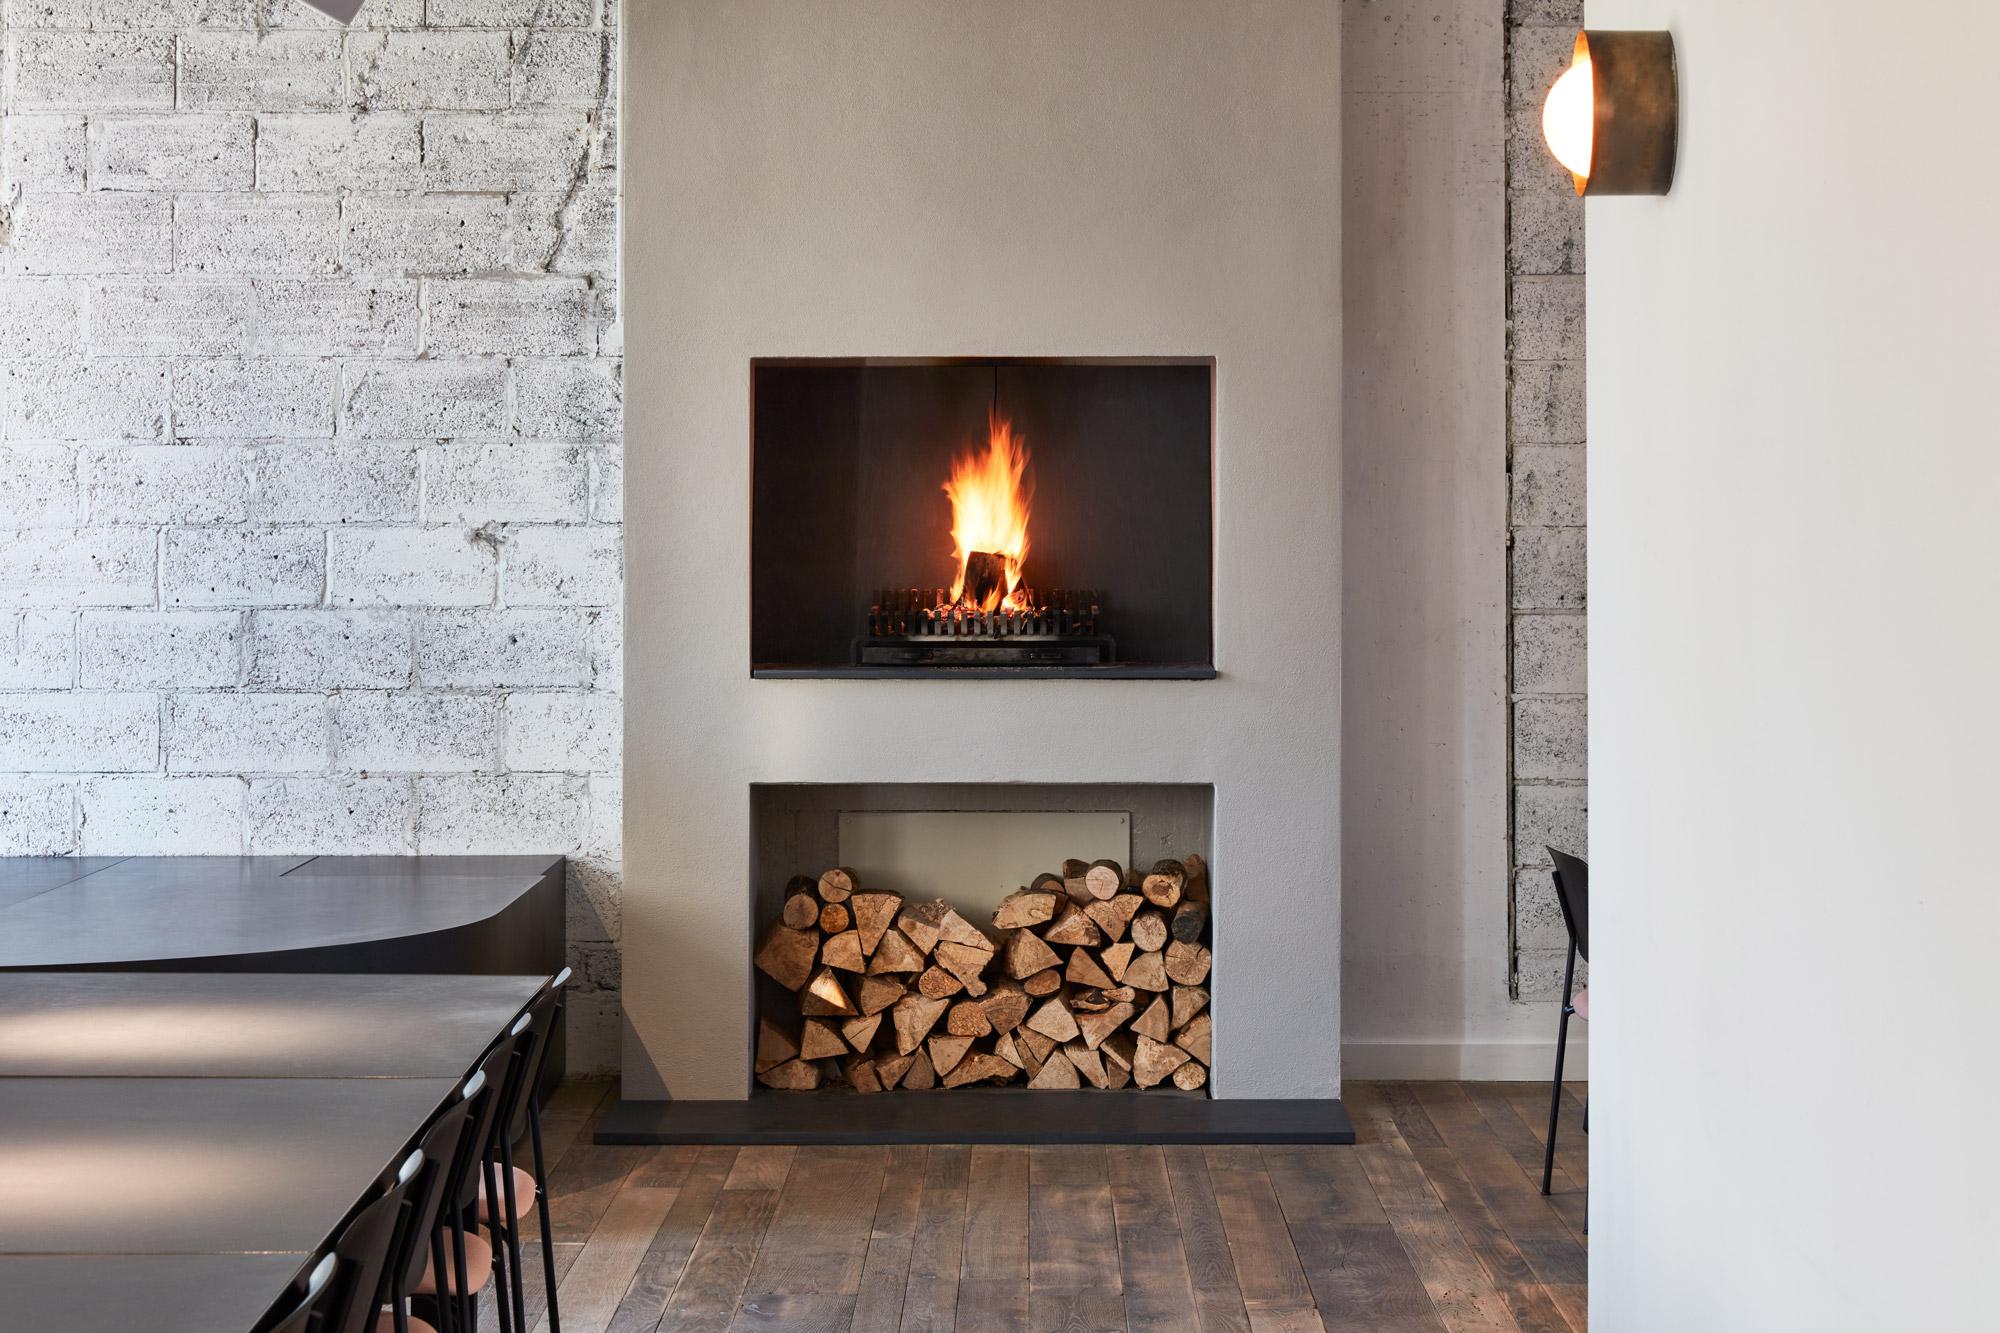 Concrete fireplace with log storage below